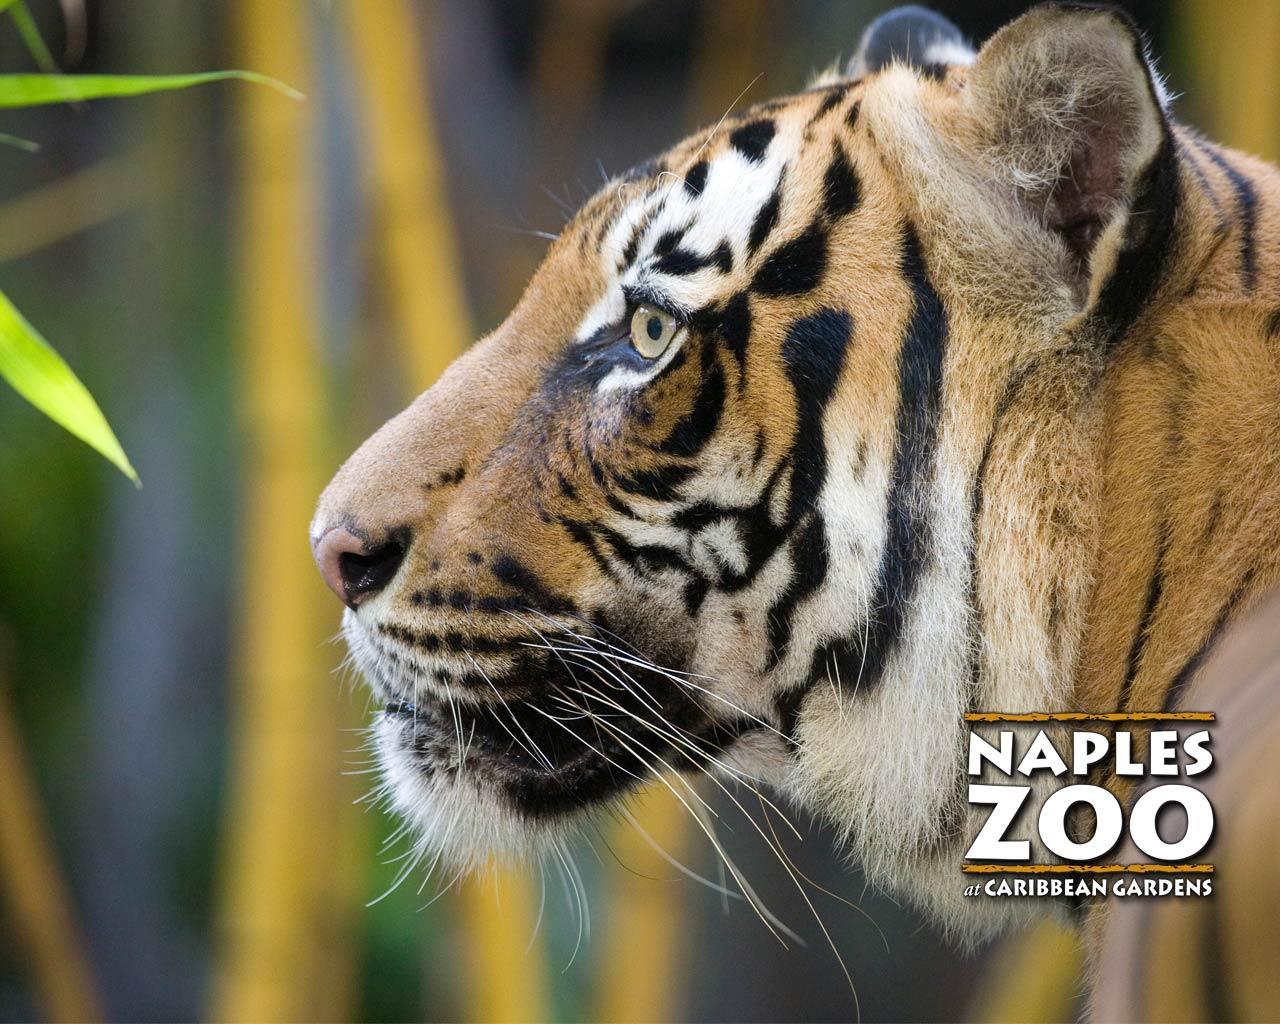 http://2.bp.blogspot.com/-ga03Sib8XrM/TbI5GQtJh7I/AAAAAAAAABk/_rCkbUKLGhM/s1600/tiger-wallpaper-naples-zoo1.jpg